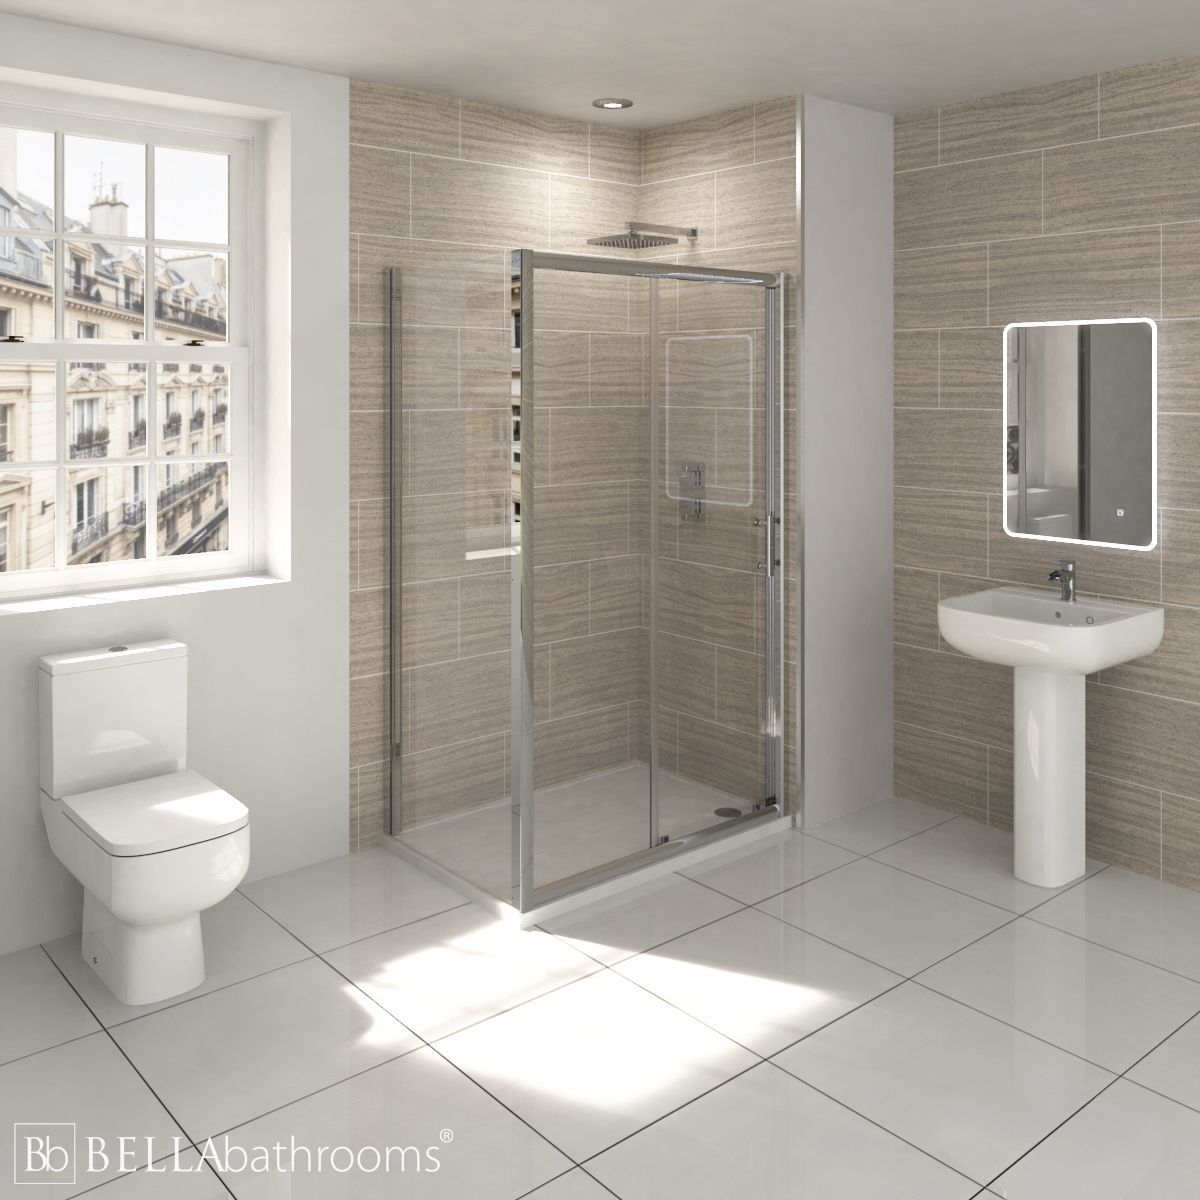 RAK Series 600 En-Suite Bathroom with Pacific Sliding Shower Enclosure